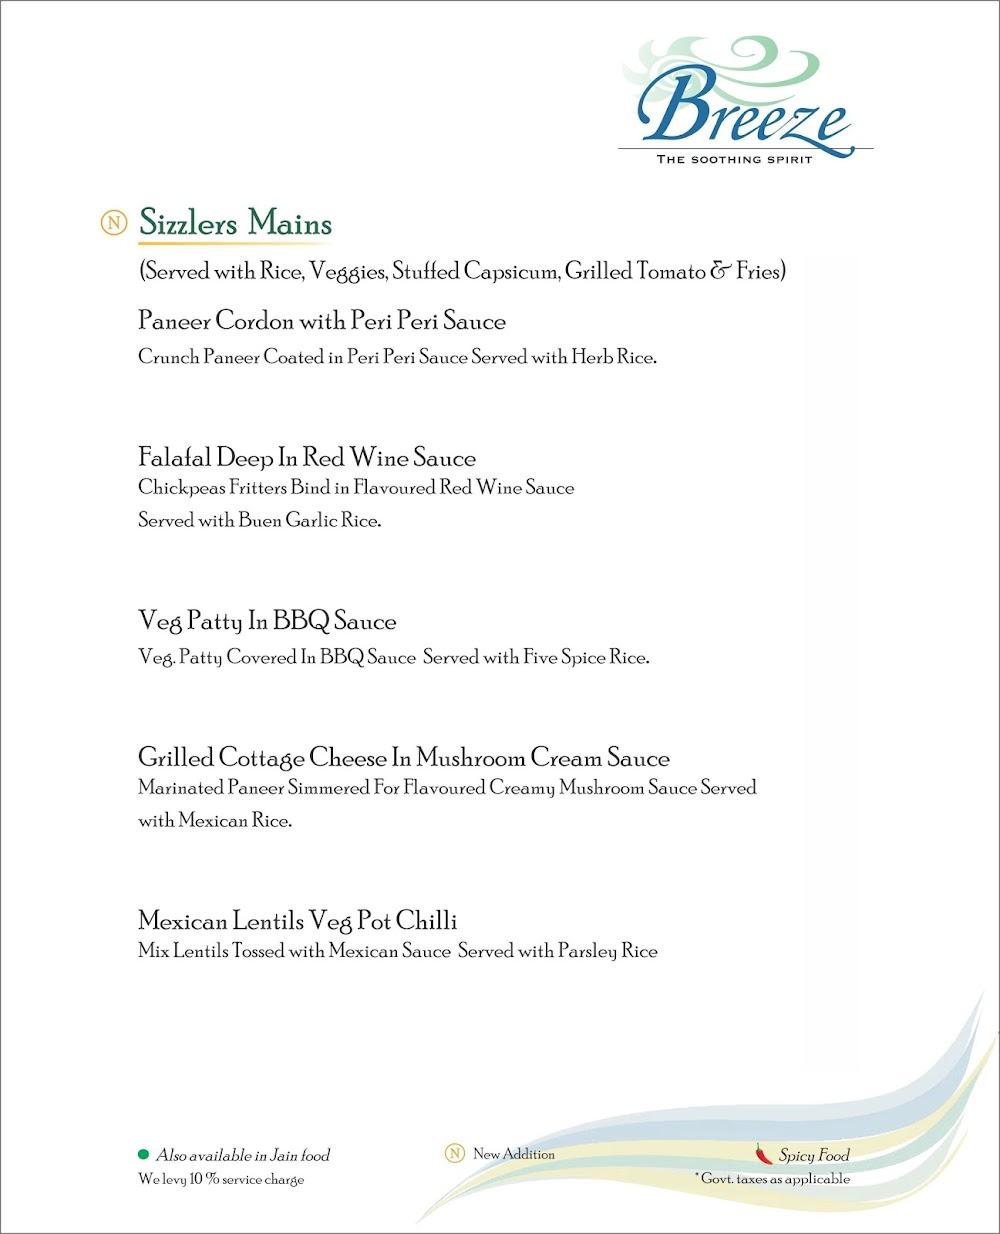 Breeze Lounge menu 8